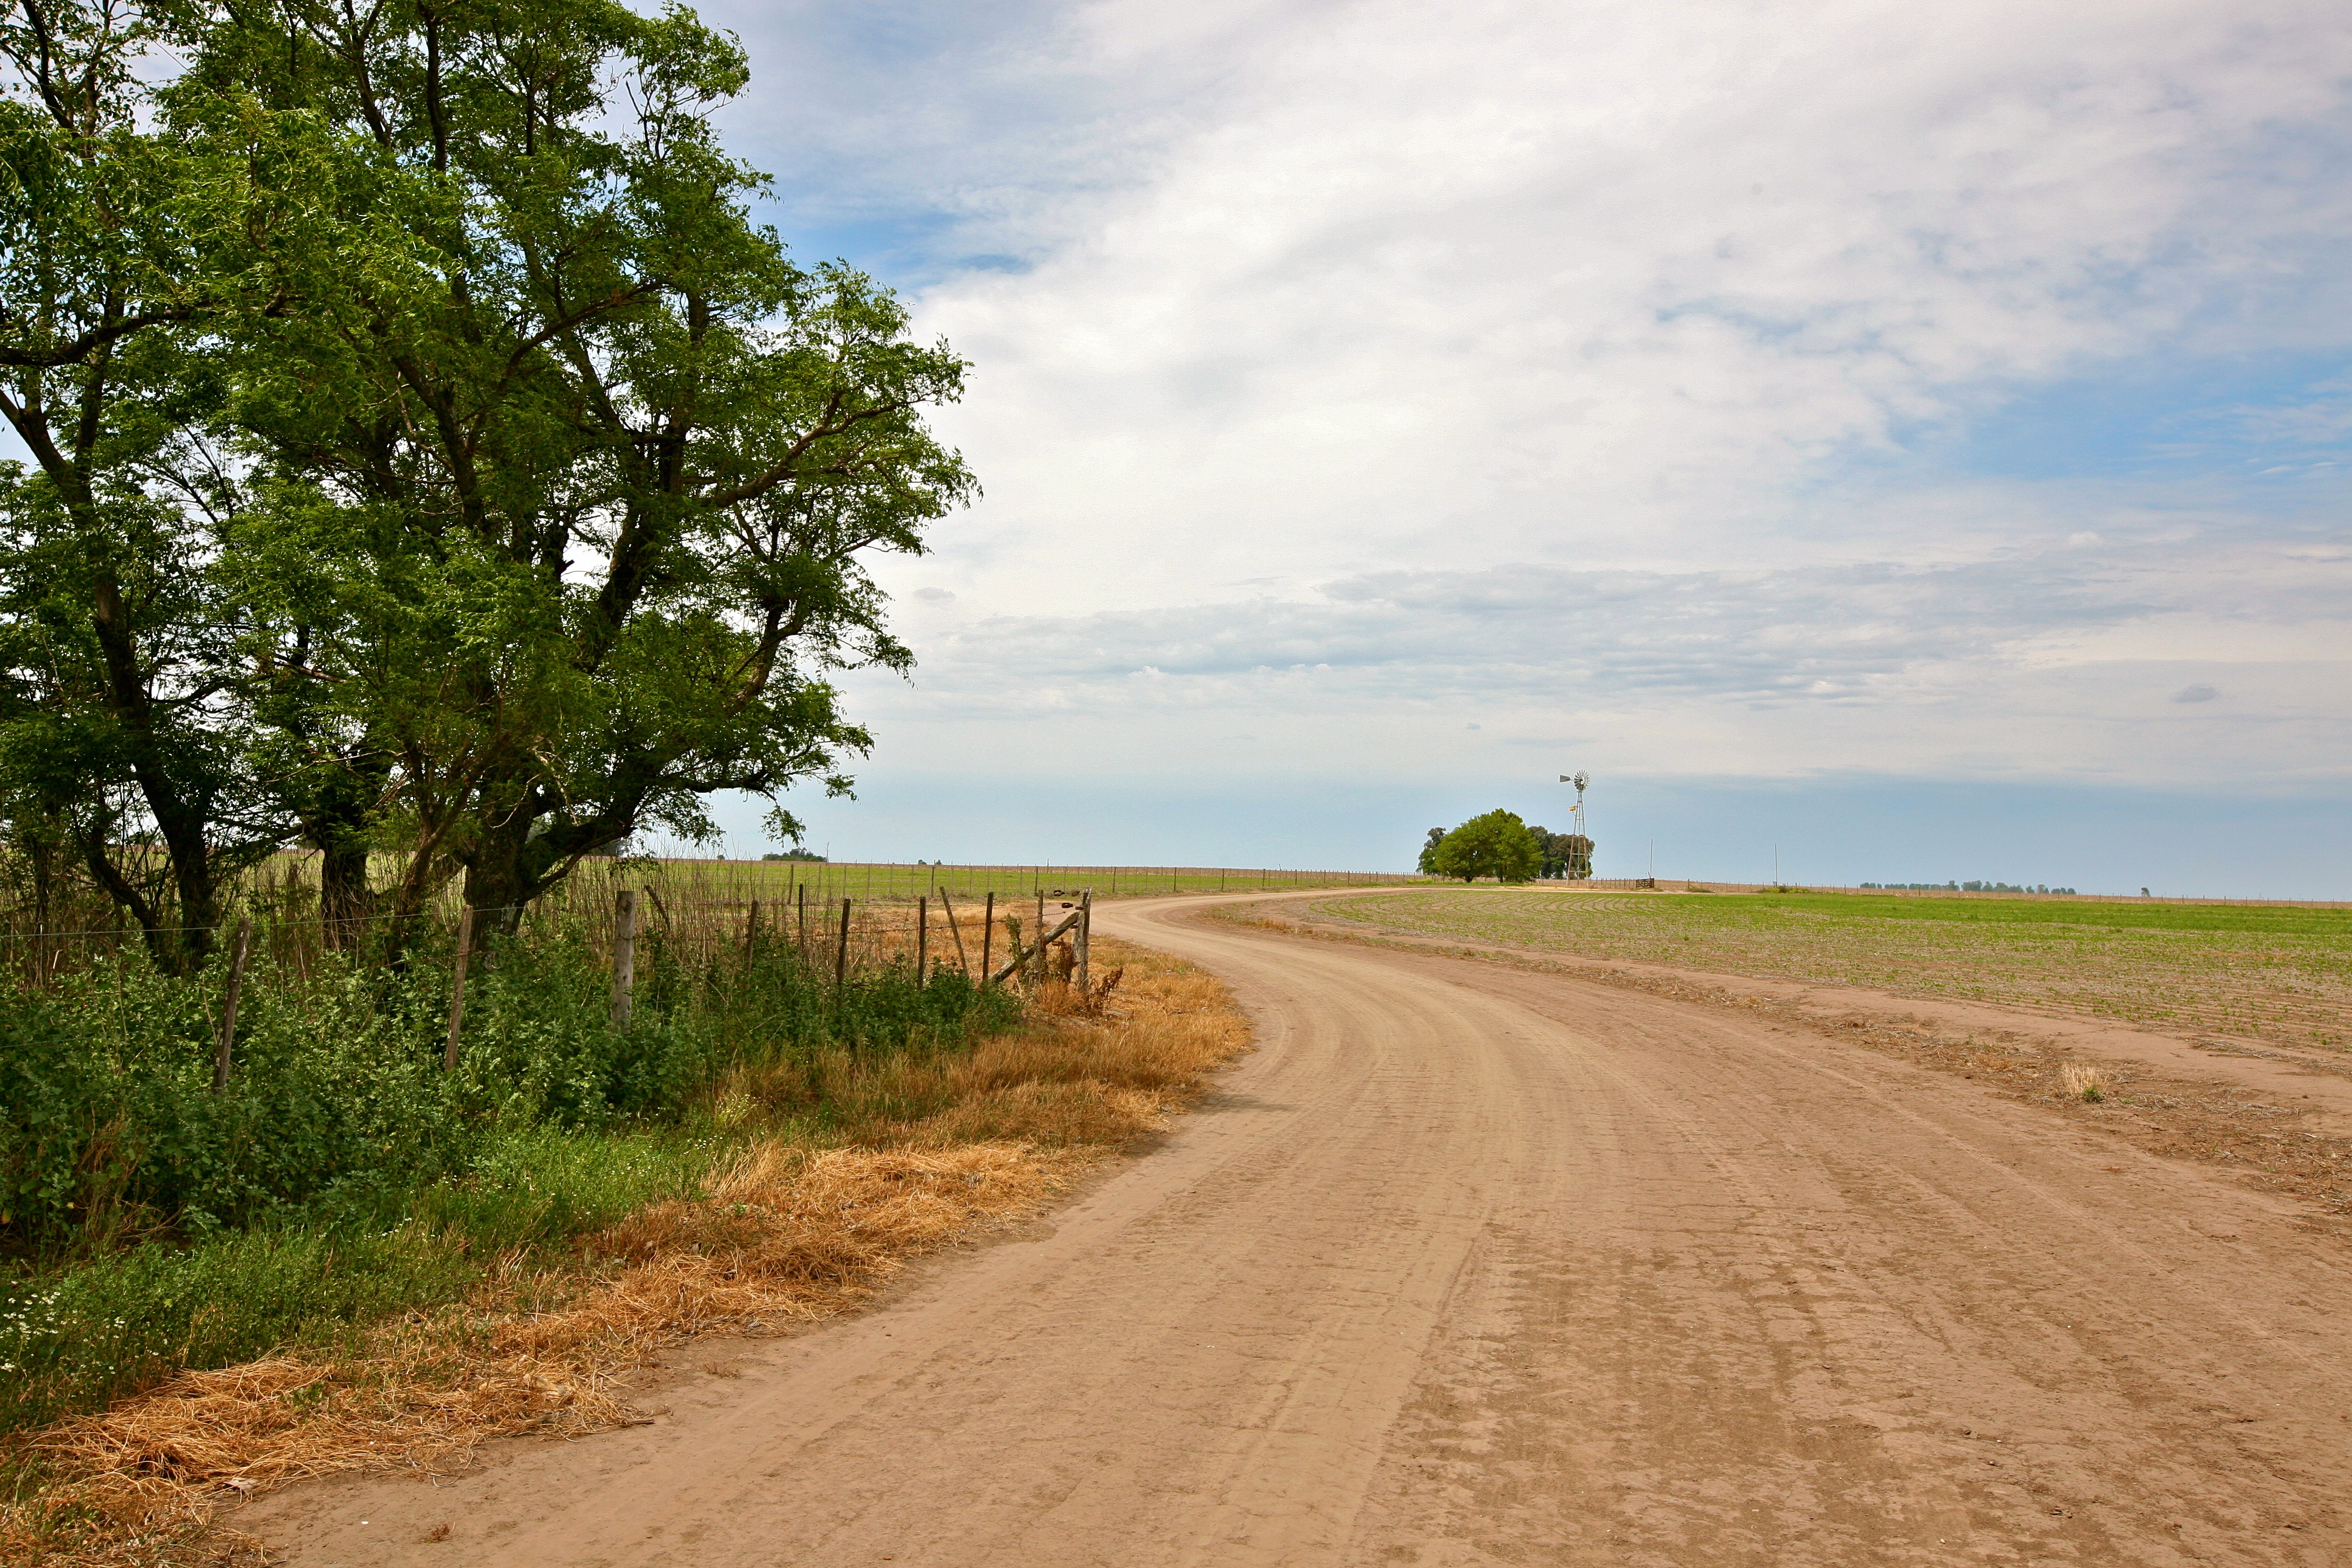 A road and farm land essay